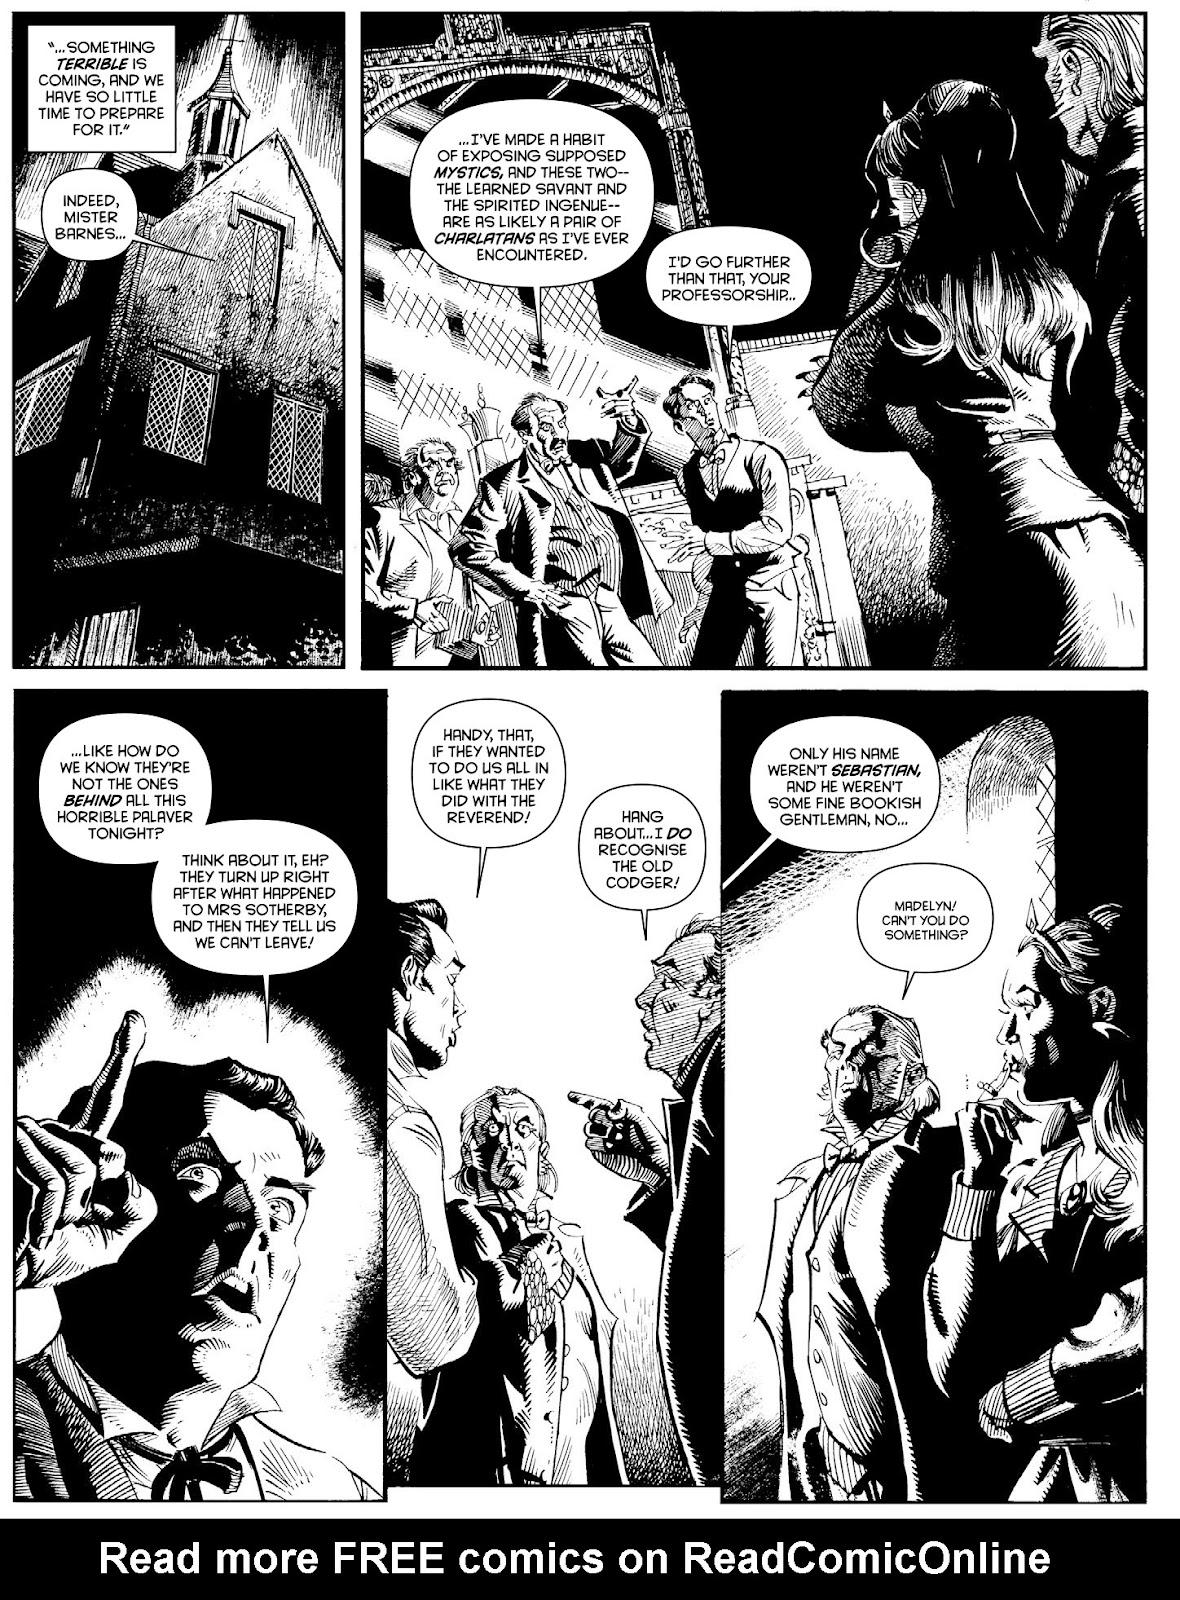 Judge Dredd Megazine (Vol. 5) issue 427 - Page 95